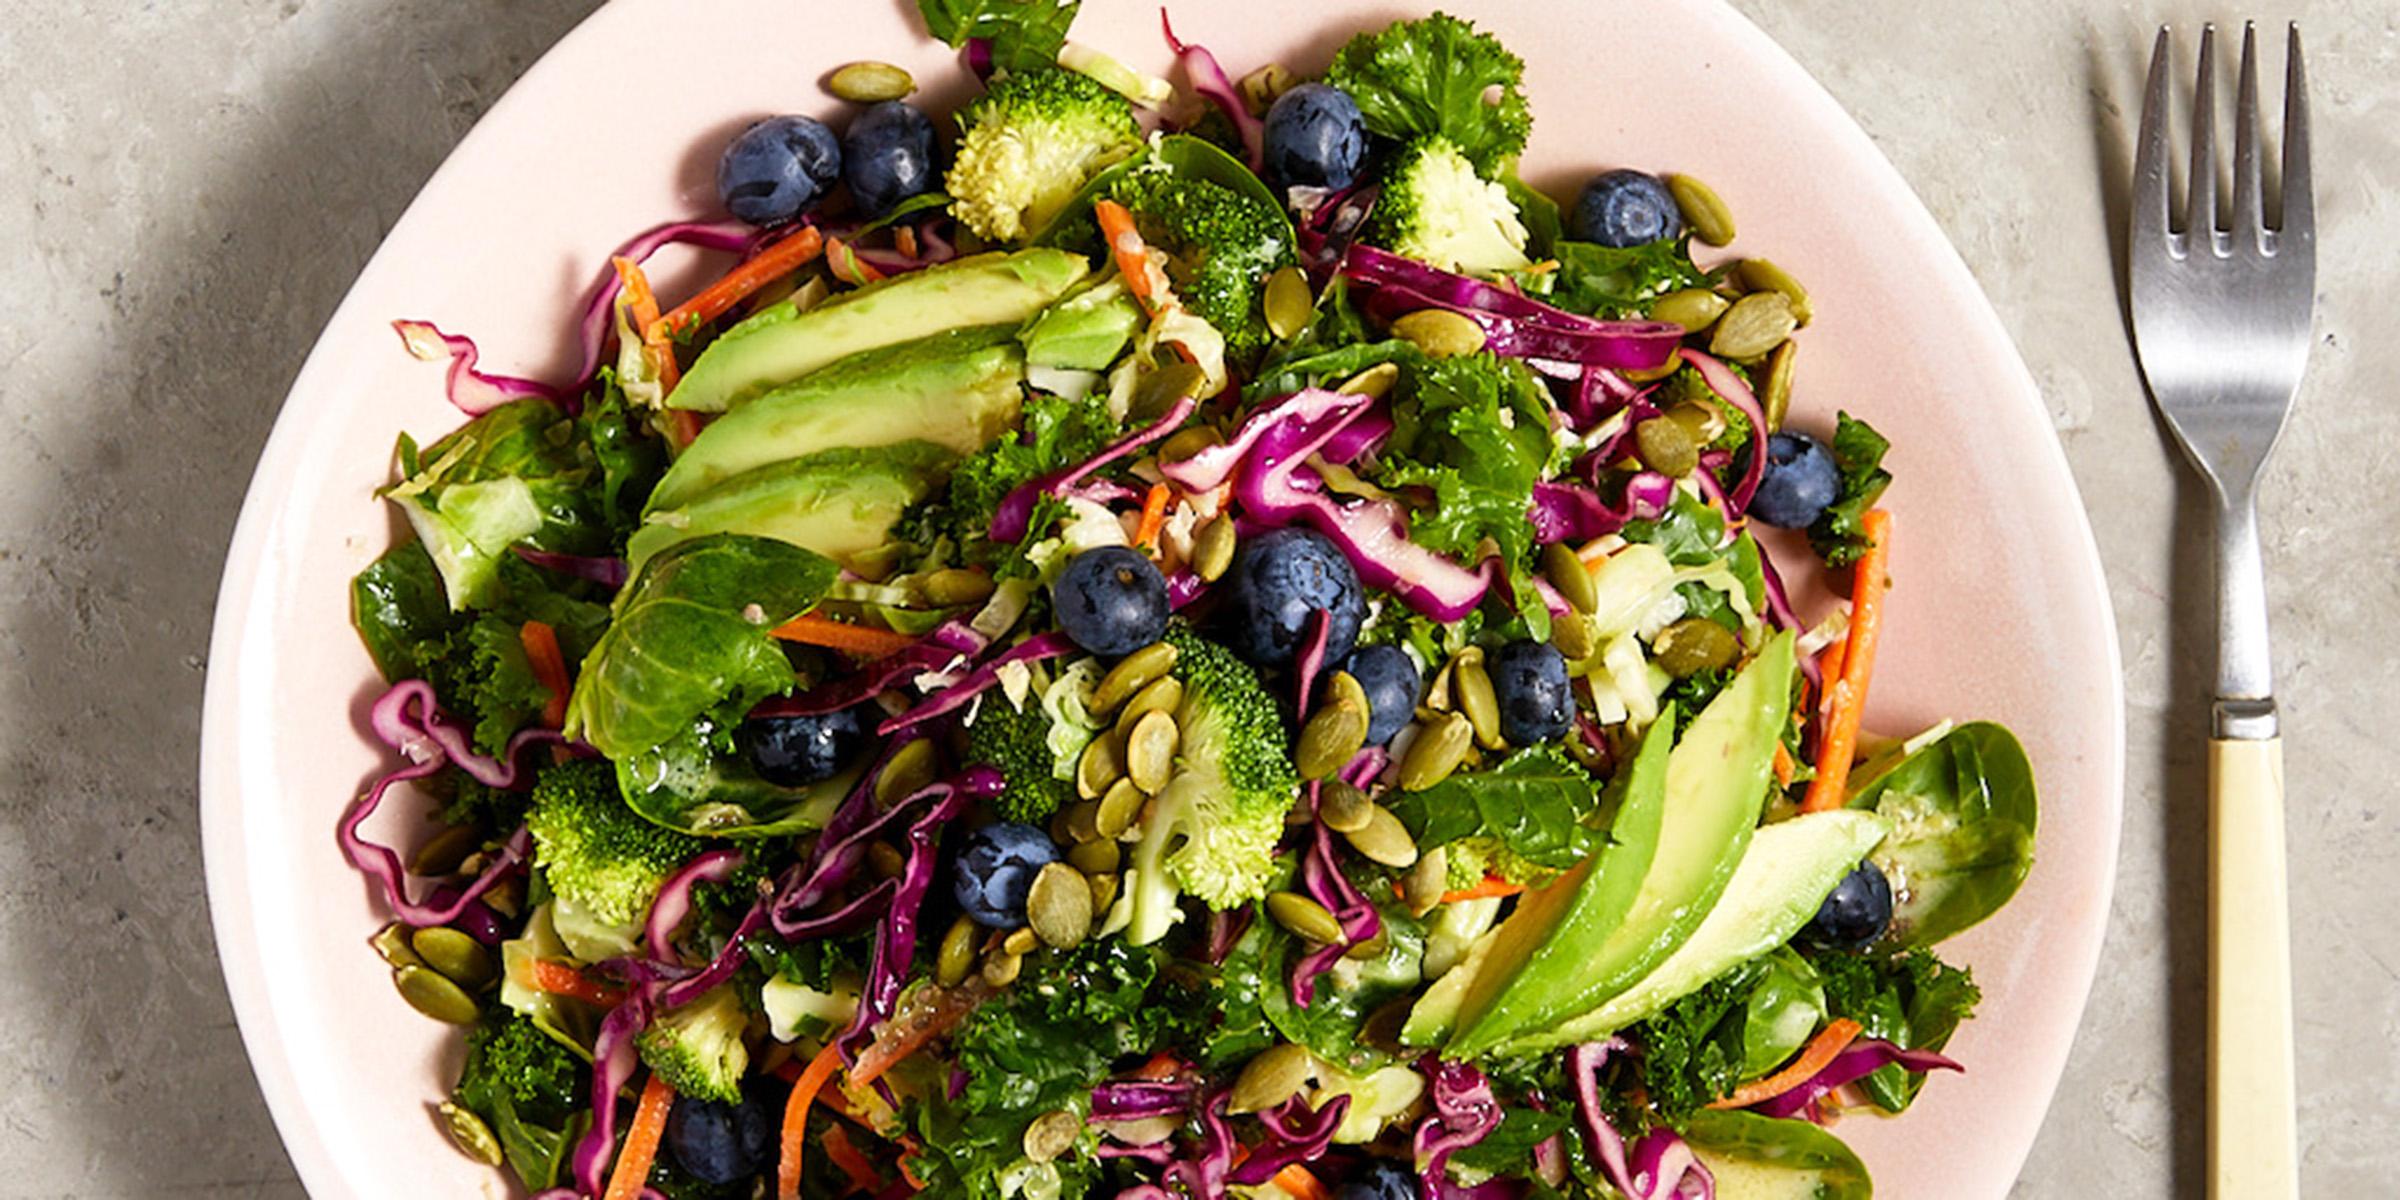 Joy Bauer's Detox Salad